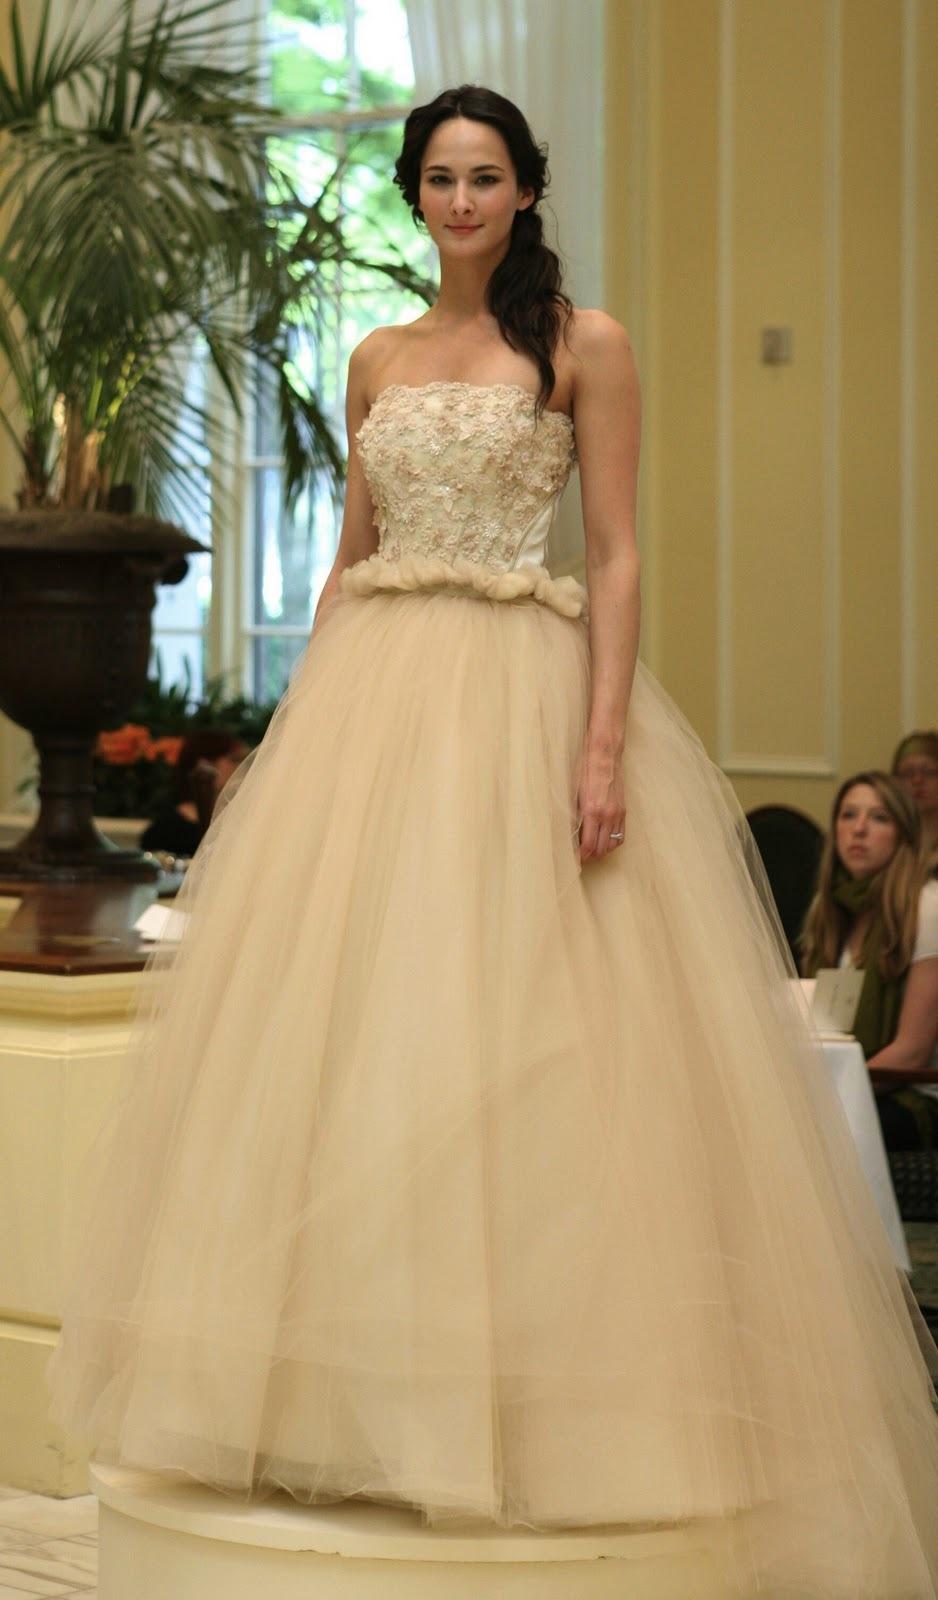 beige romantic tulle ballgown wedding dress beige wedding dresses Beige romantic tulle ballgown wedding dress